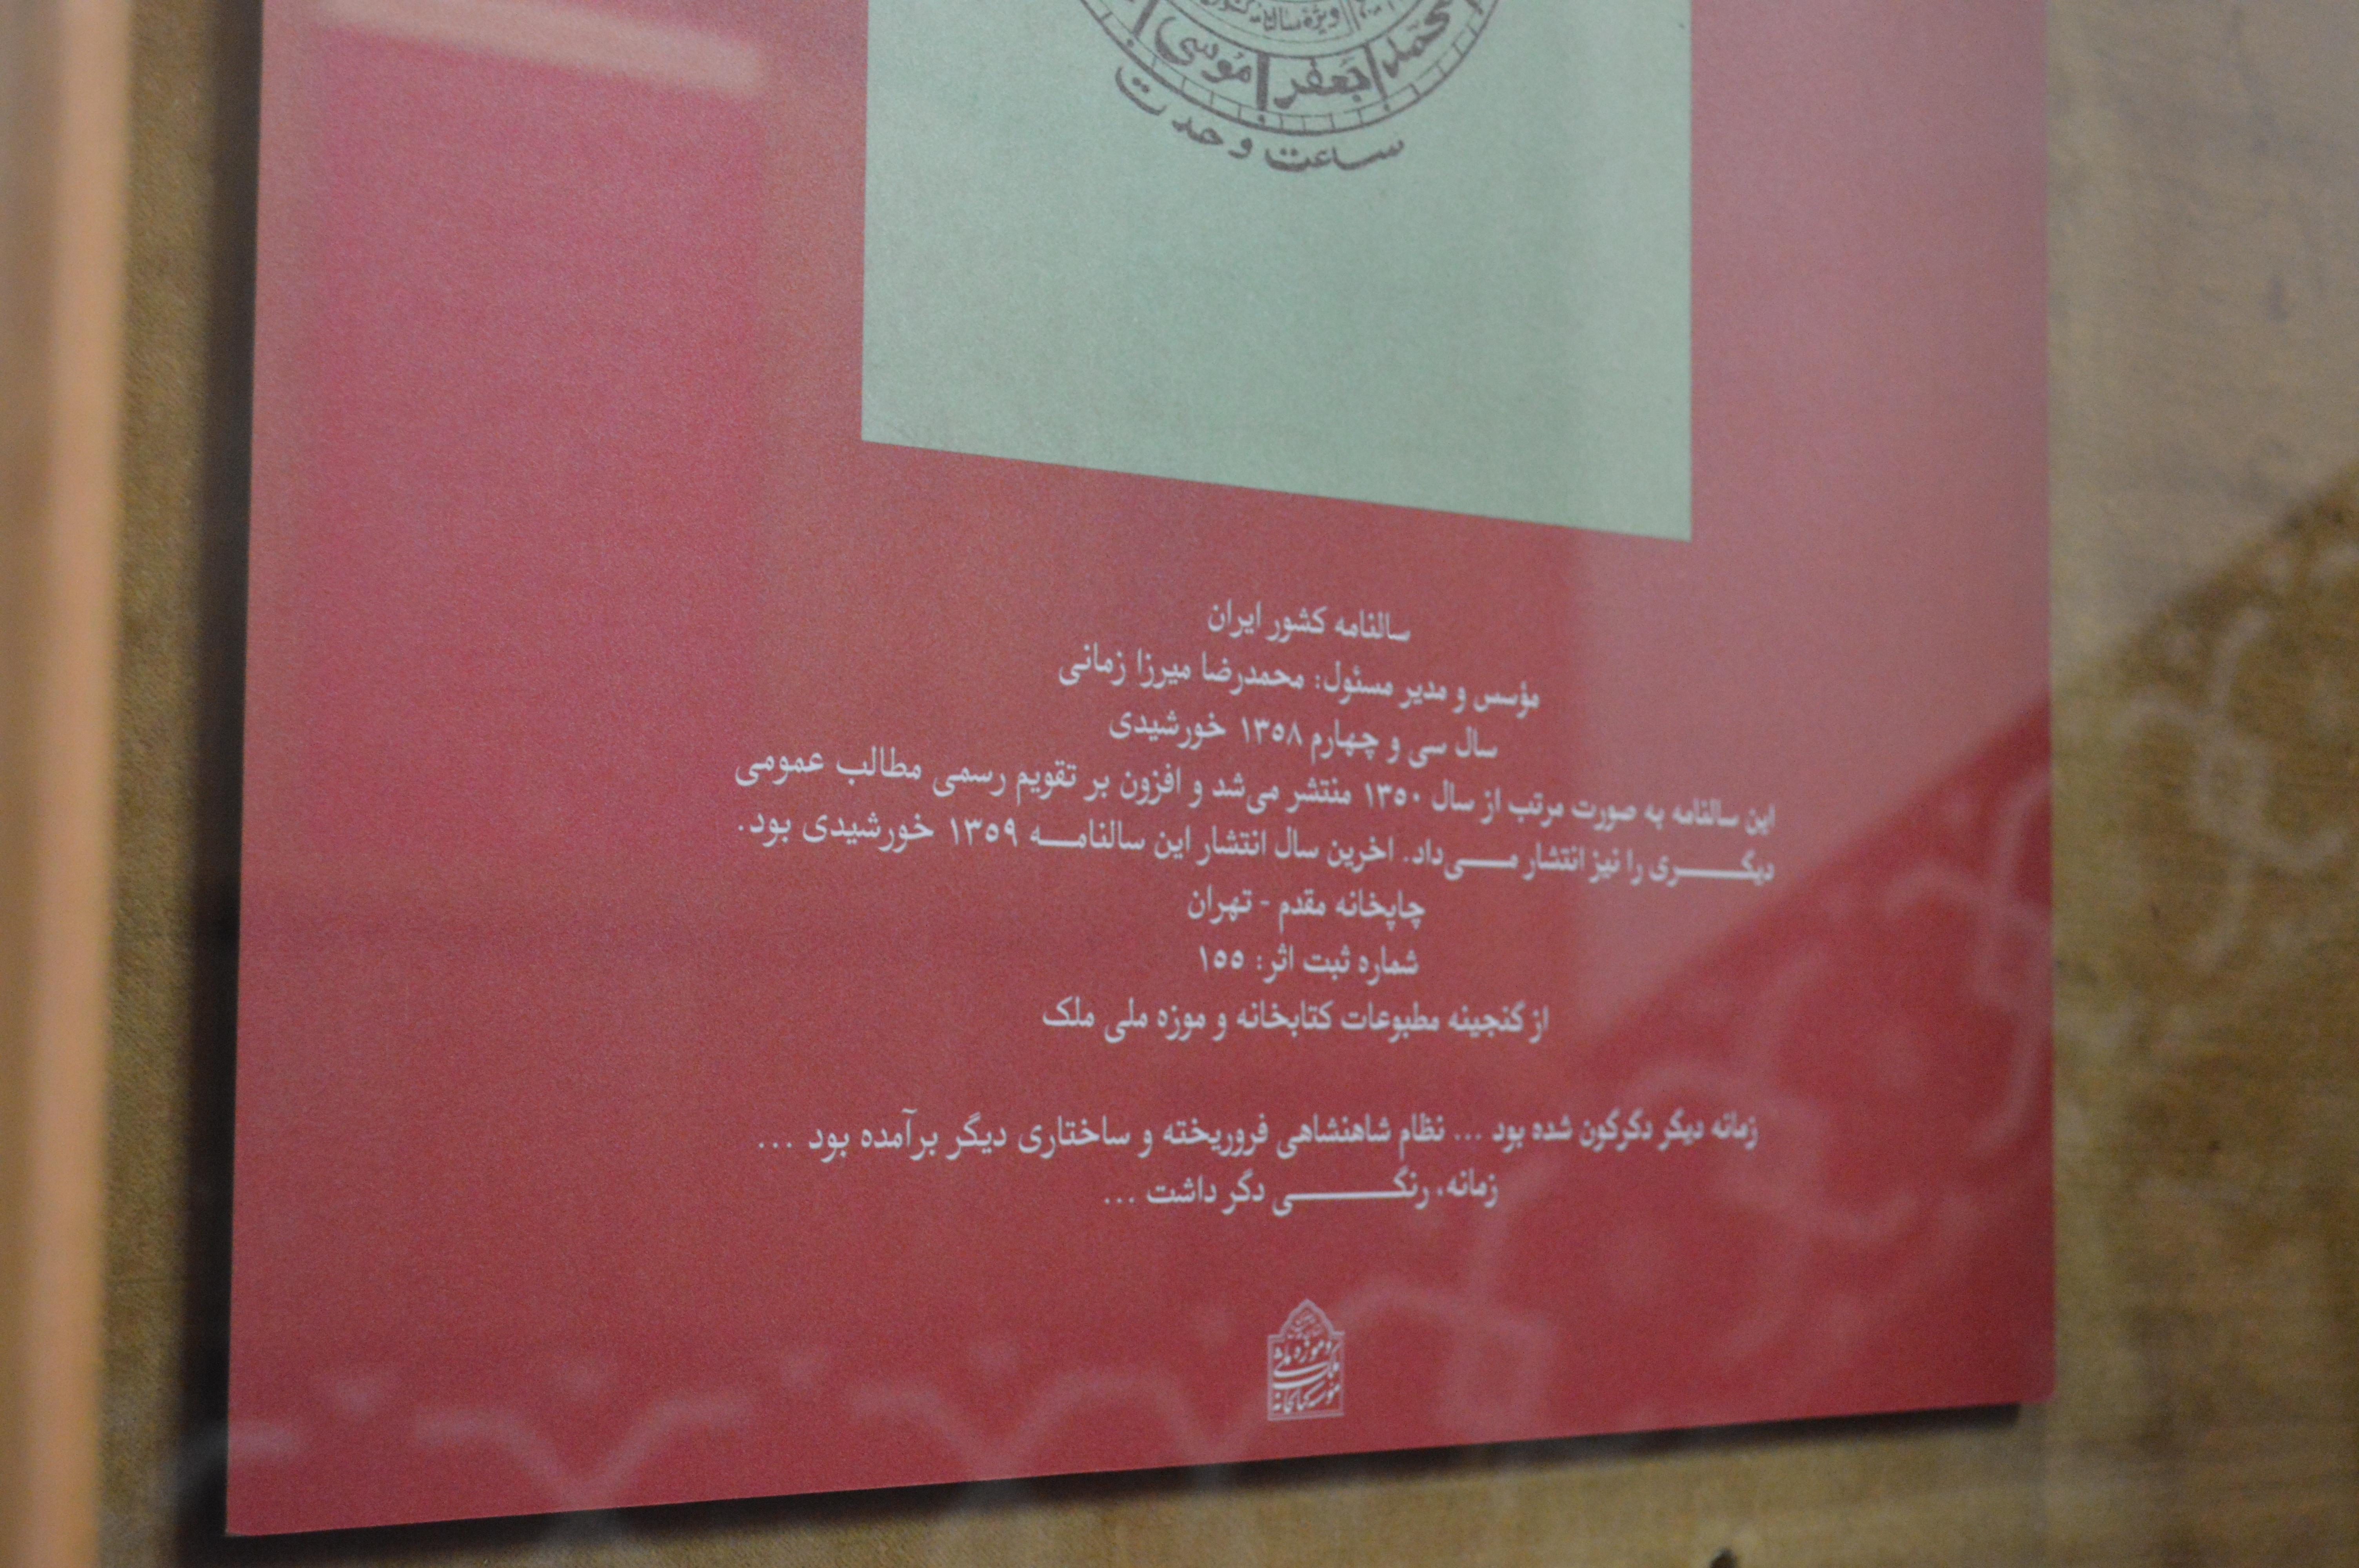 انقلاب اسلامی به روایت نشریات 4